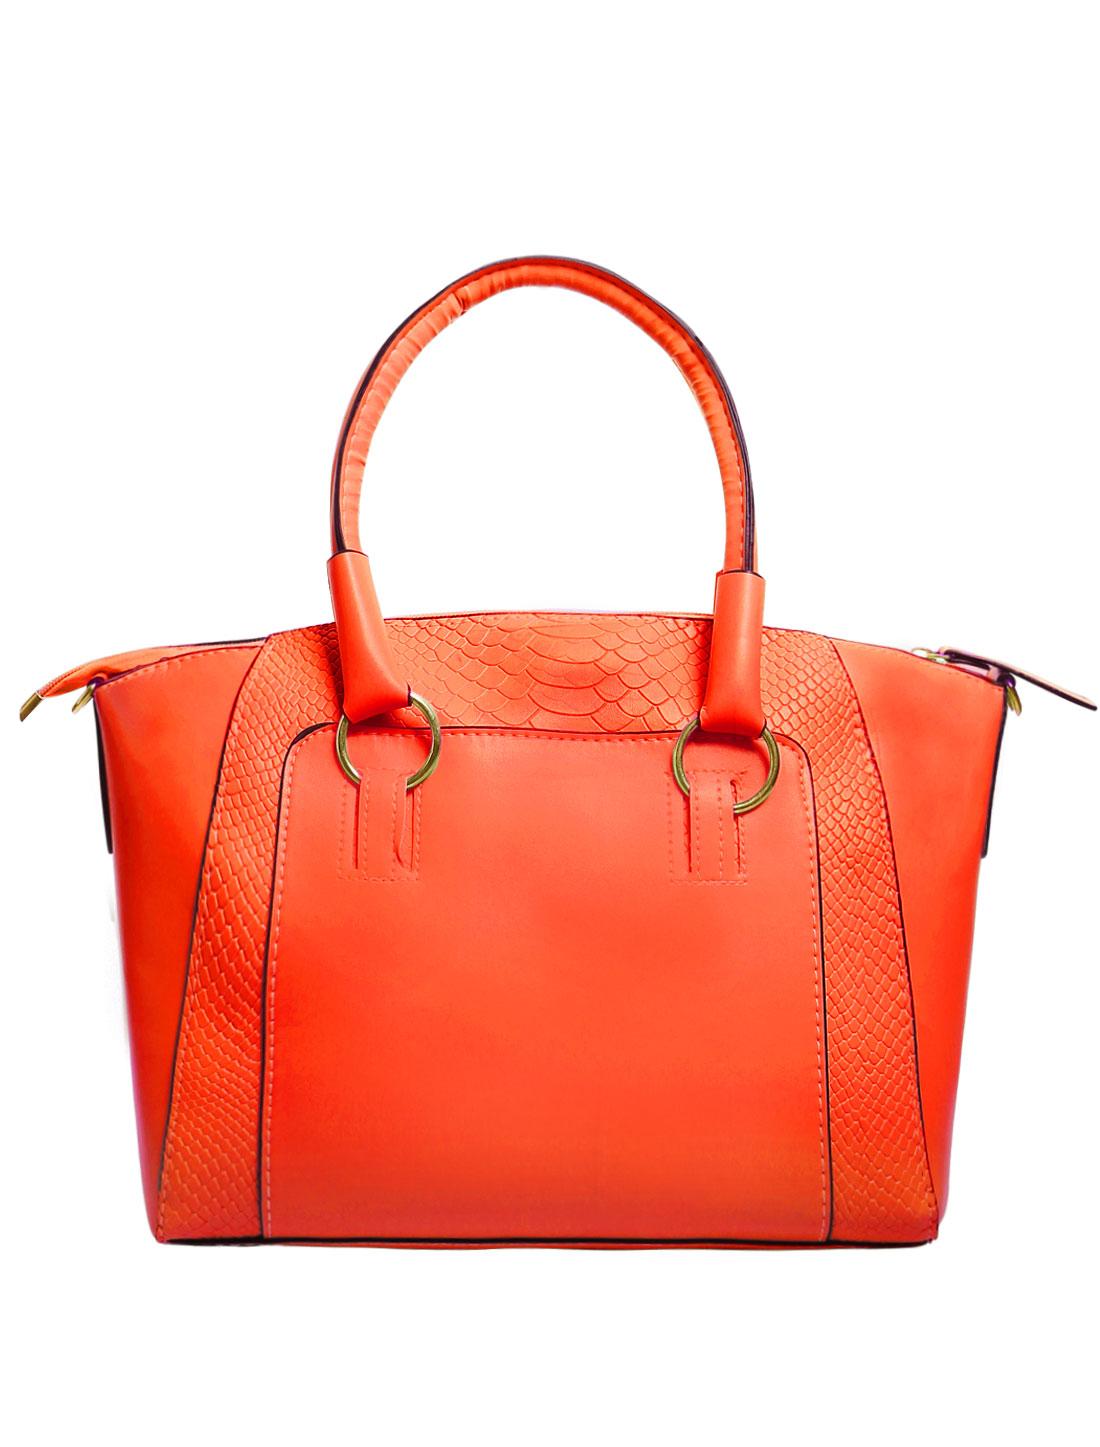 Women Faux Leather Handbag Messenger Tote Cross Body Shoulder Bag Crocodile Print Orange